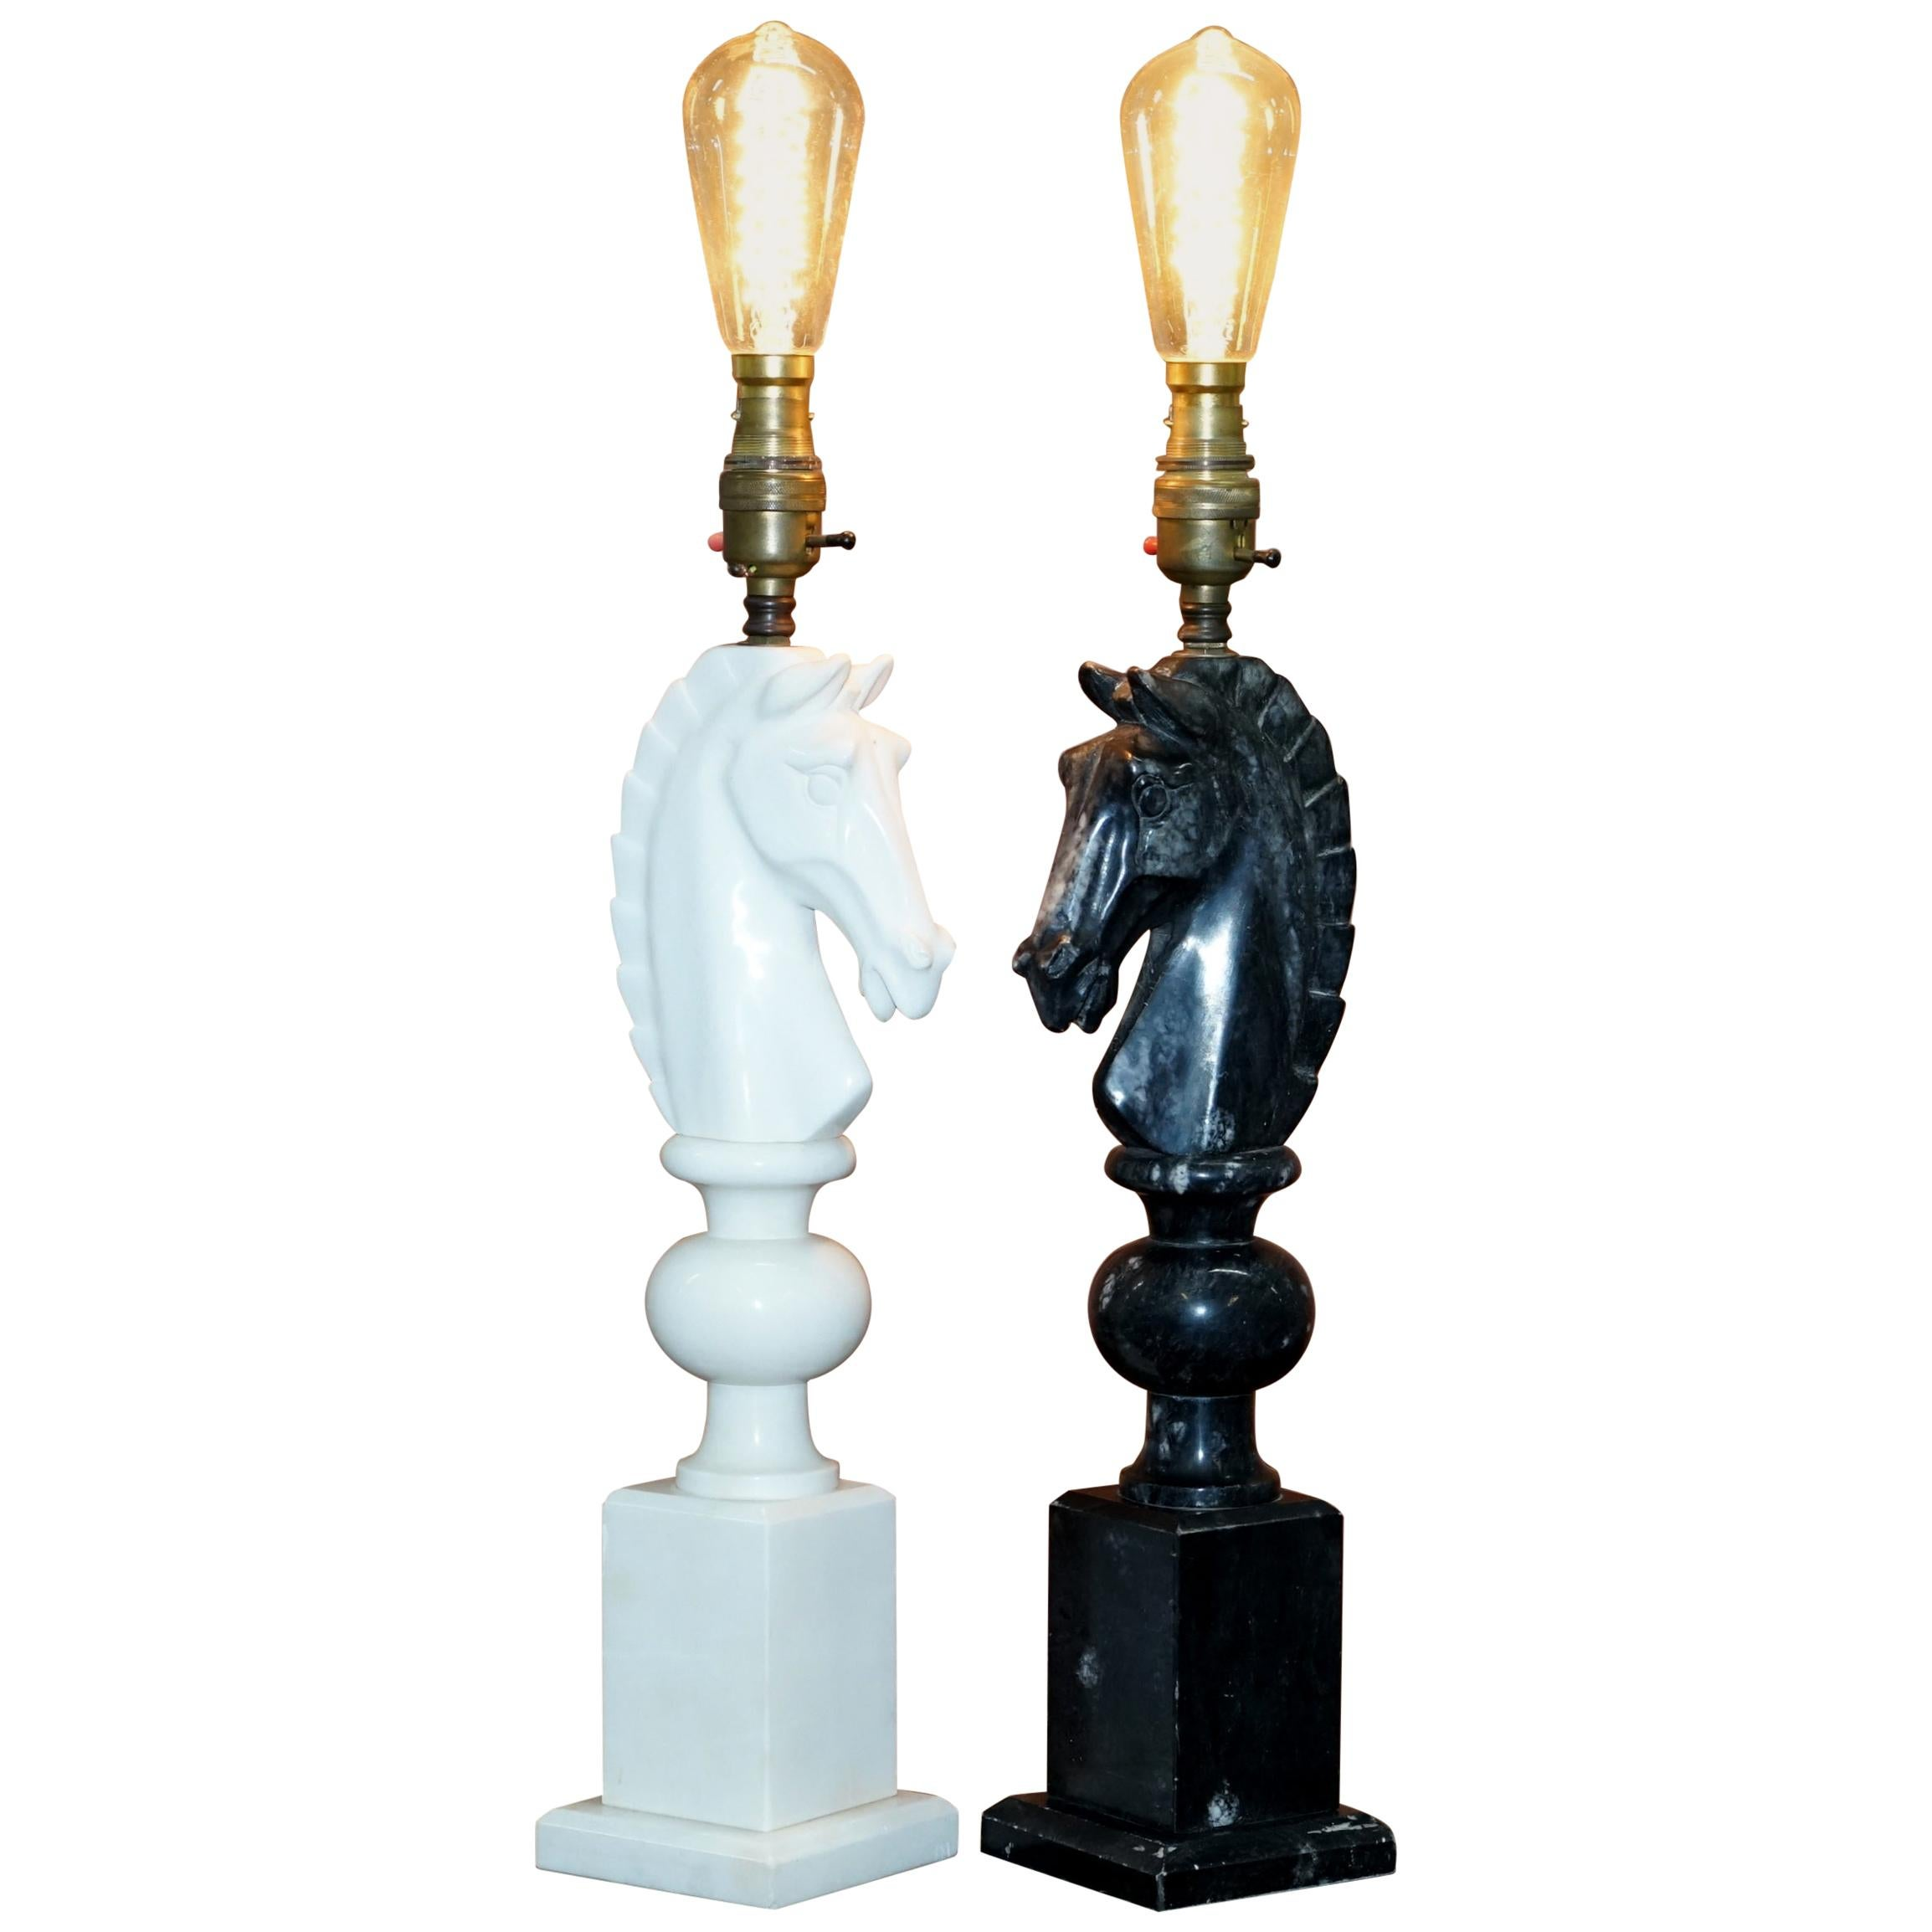 Pair of Original 1950s Italian Carrara Marble Chess Horse Lamps Fully Serviced